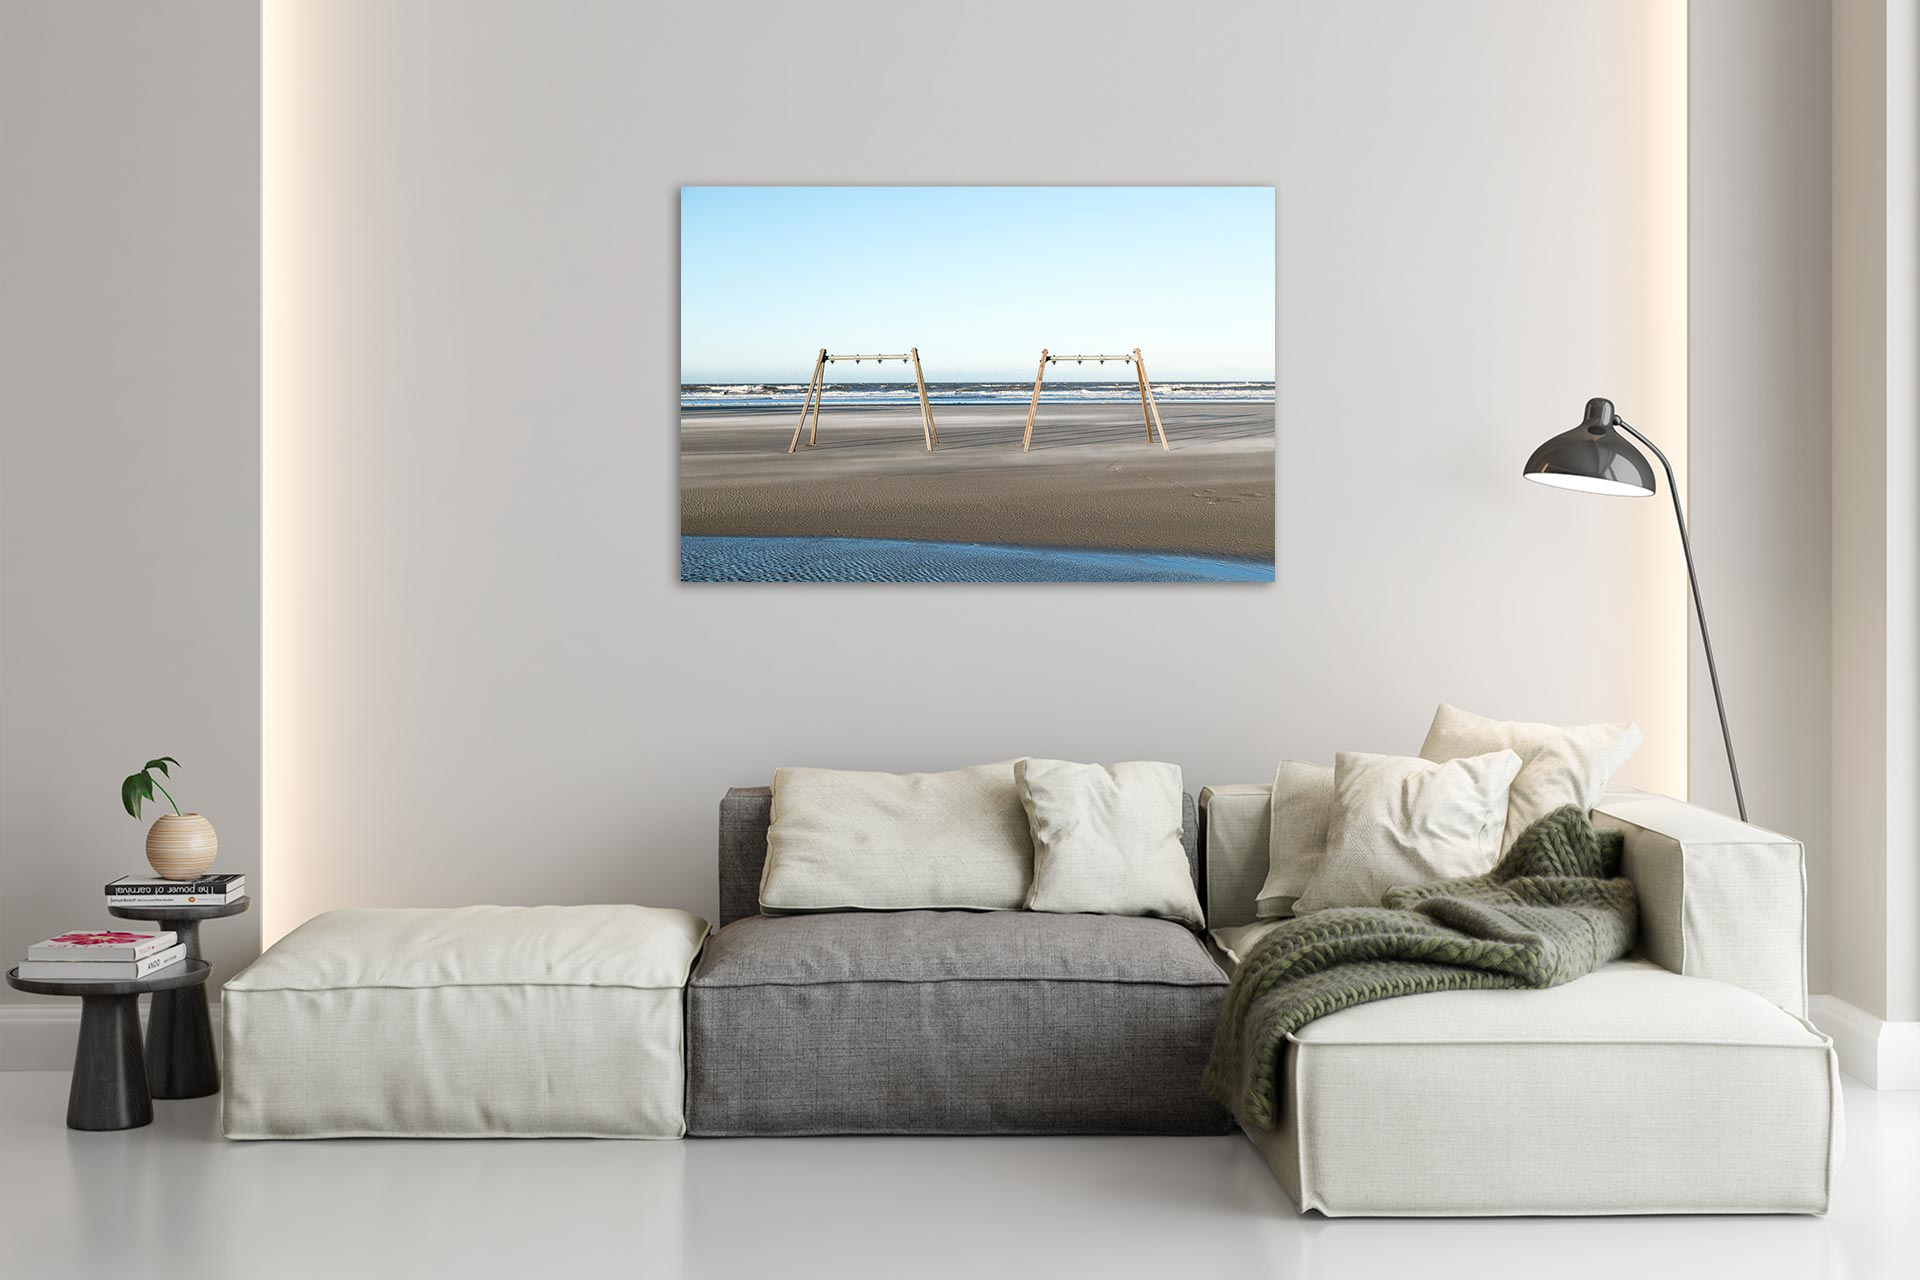 JS202-spo-2-wandbild-bild-auf-leinwand-acrylglas-aludibond-wohnzimmer